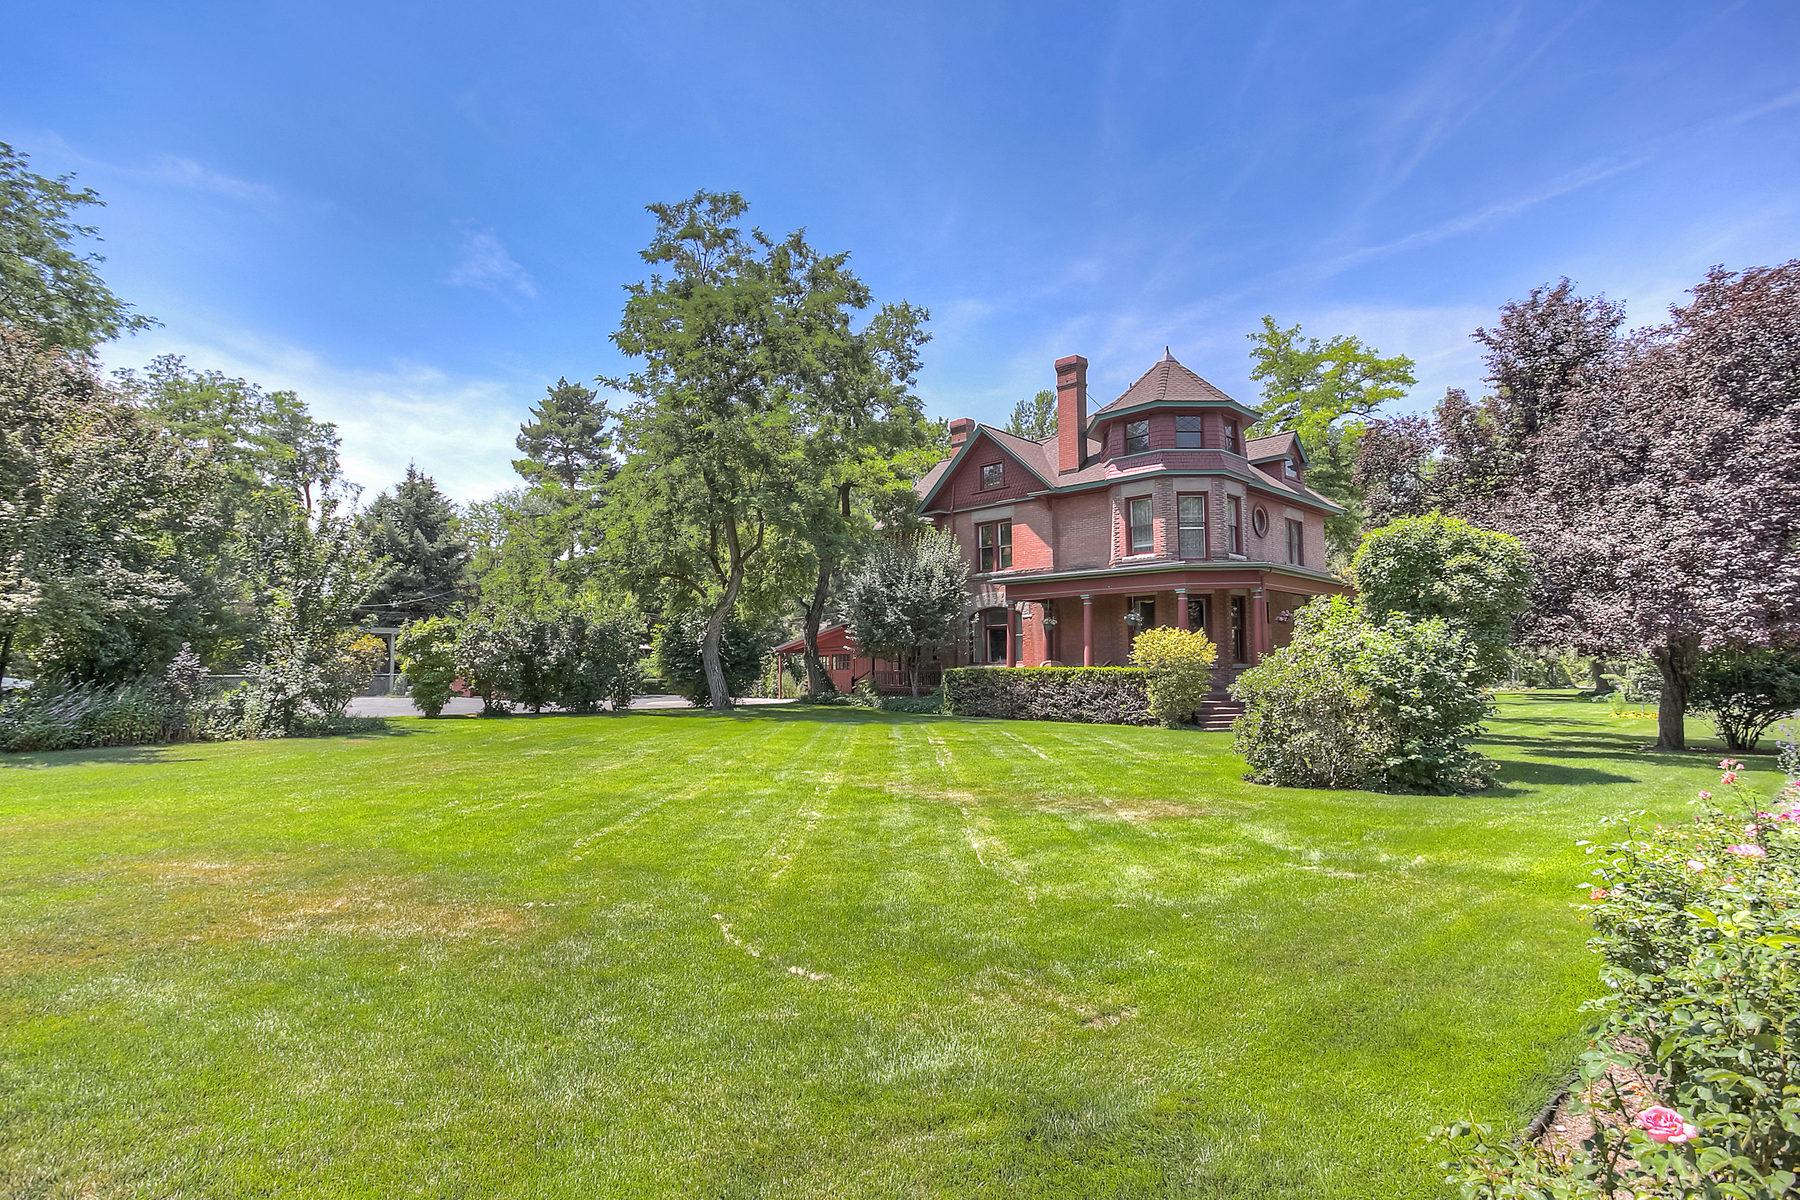 Villa per Vendita alle ore The Walton Mansion - Timeless Elegance 5197 S Wesley Rd Salt Lake City, Utah 84117 Stati Uniti